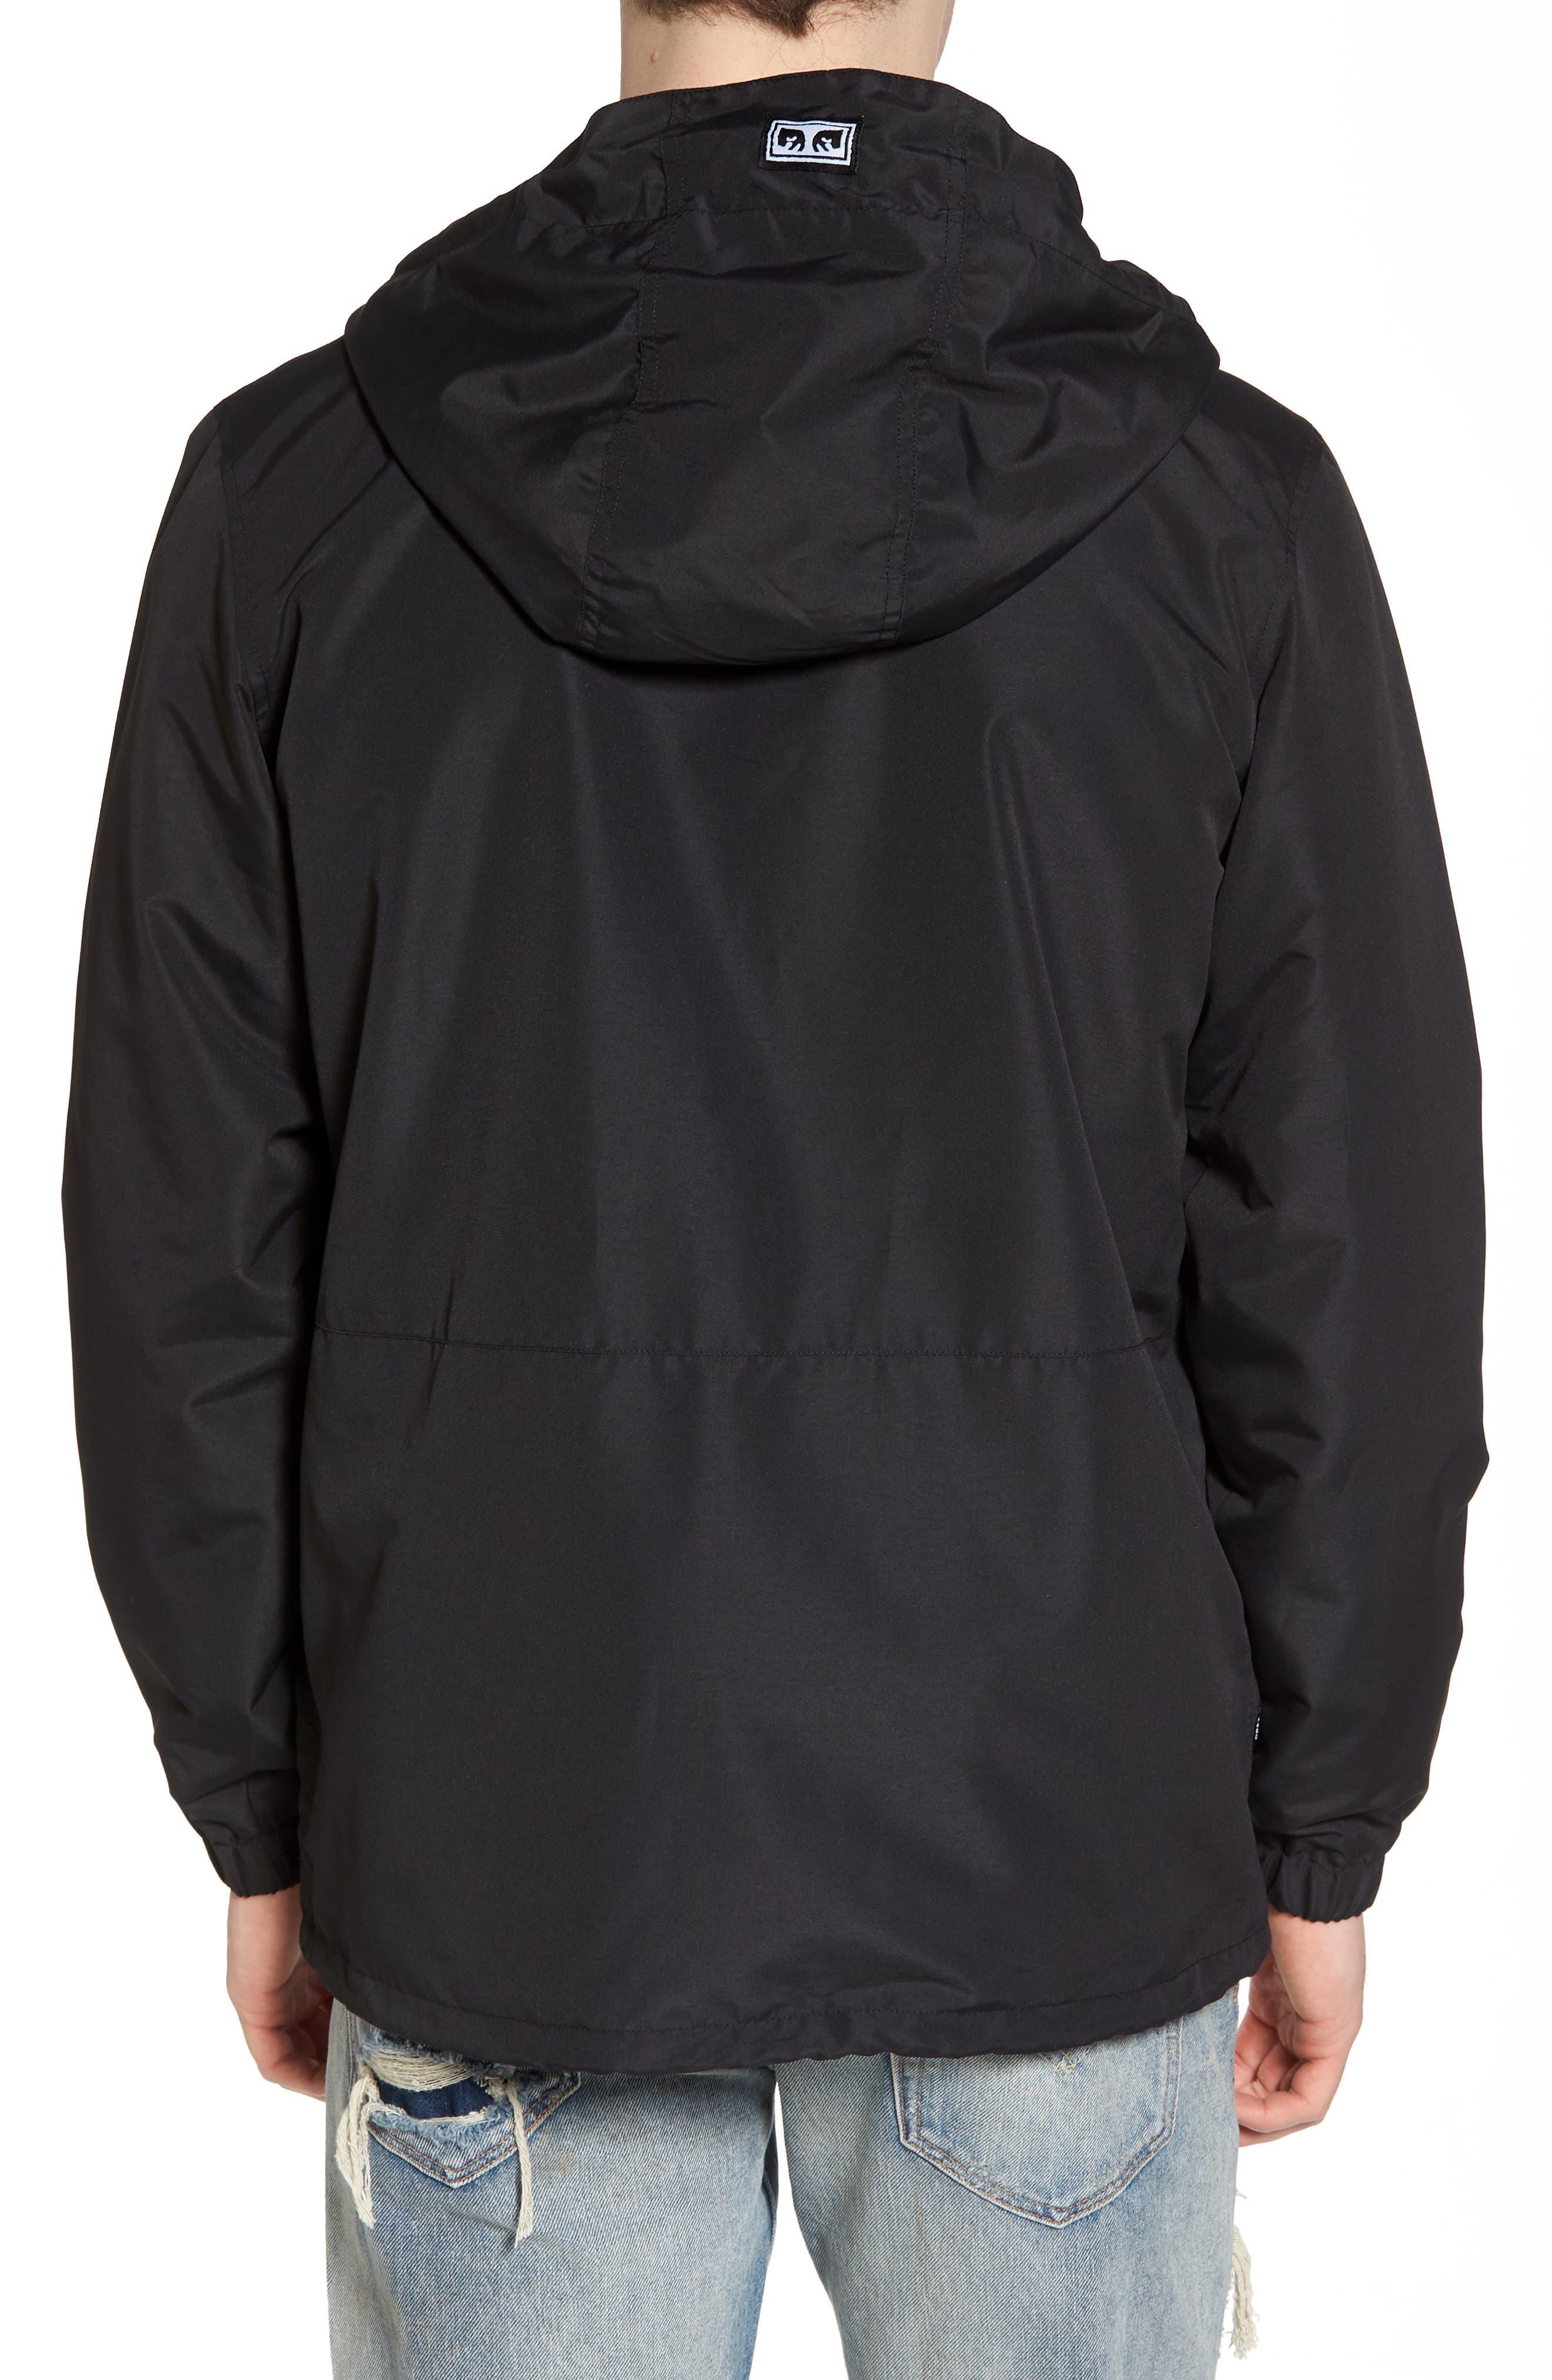 Ambush Hooded Jacket,                             Alternate thumbnail 2, color,                             Black